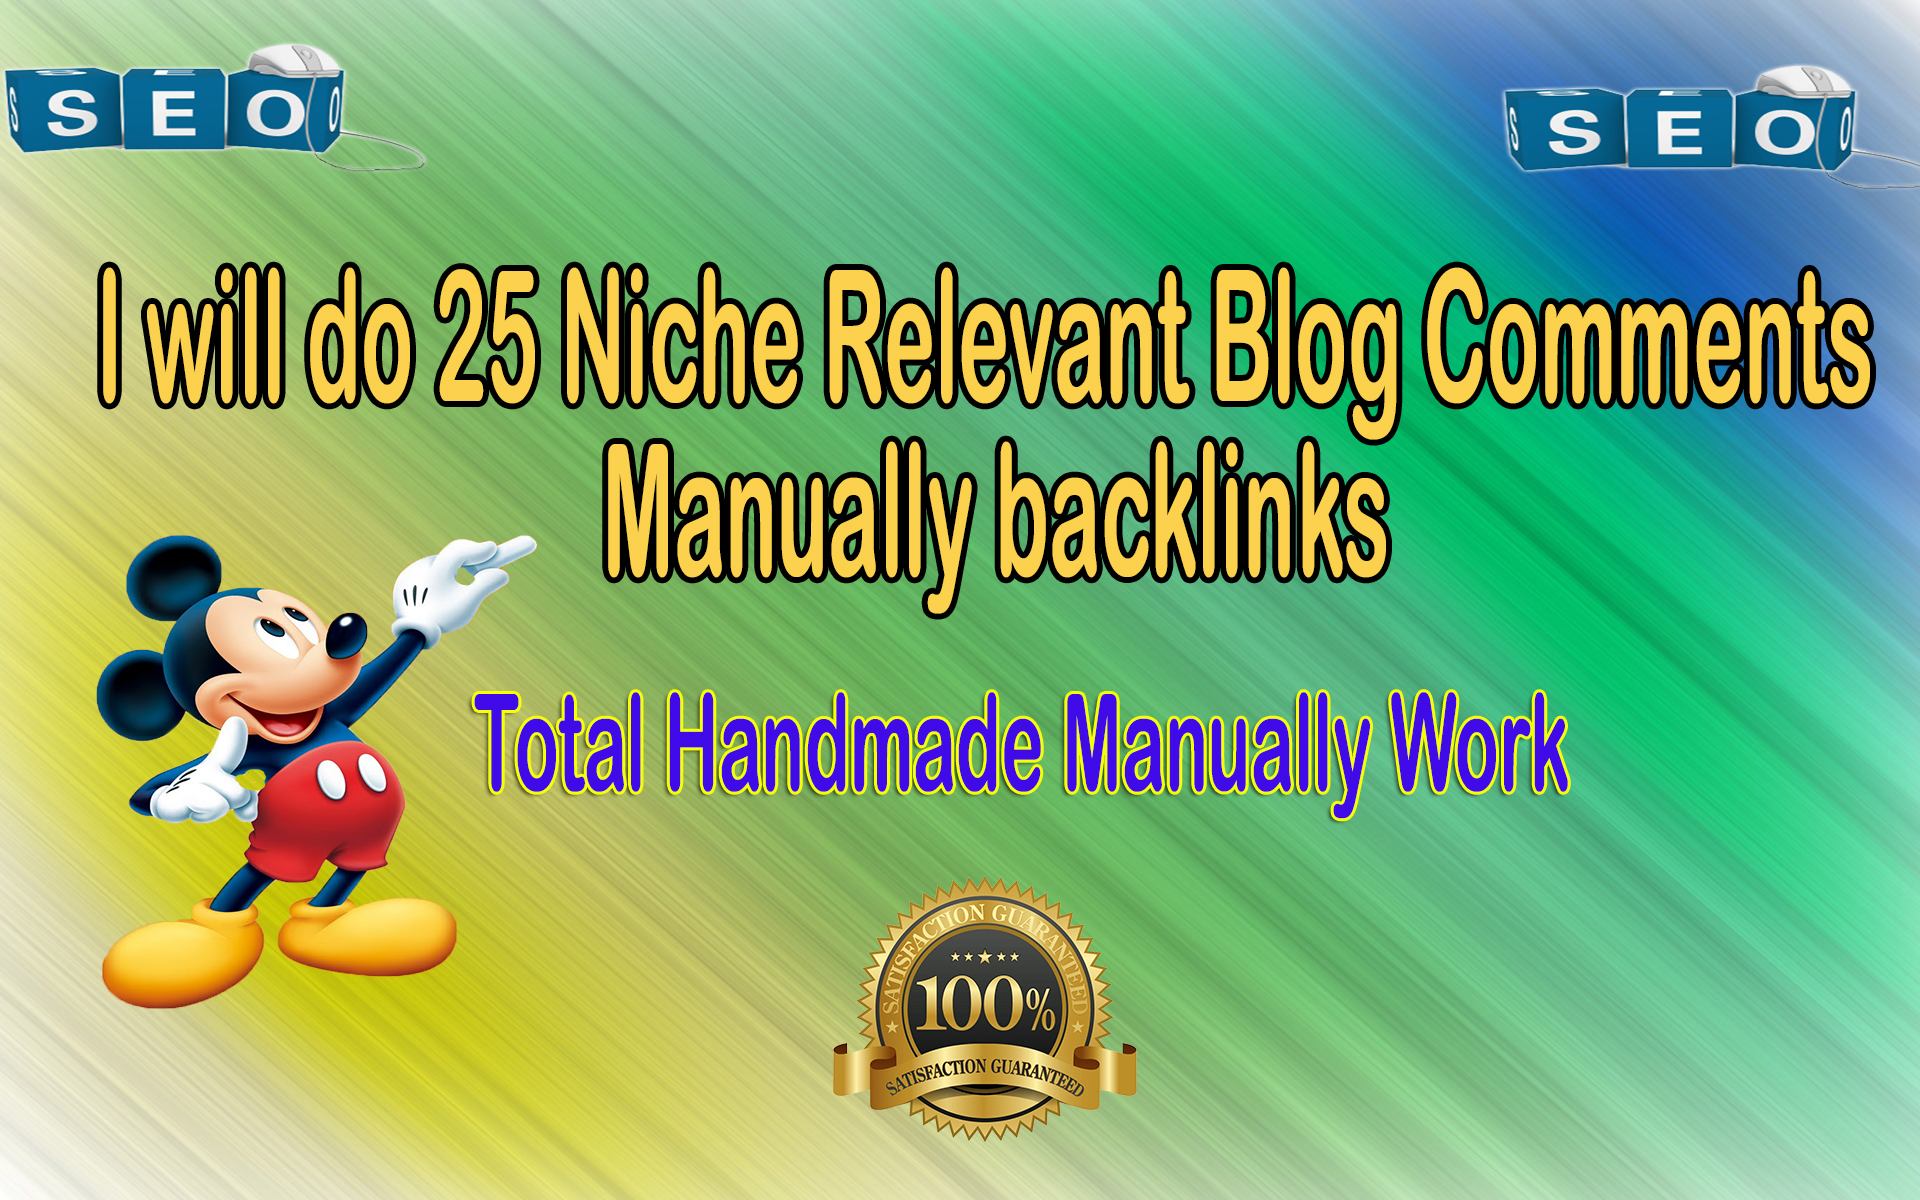 25 NIche Relevant bLog Commnts Rank your website